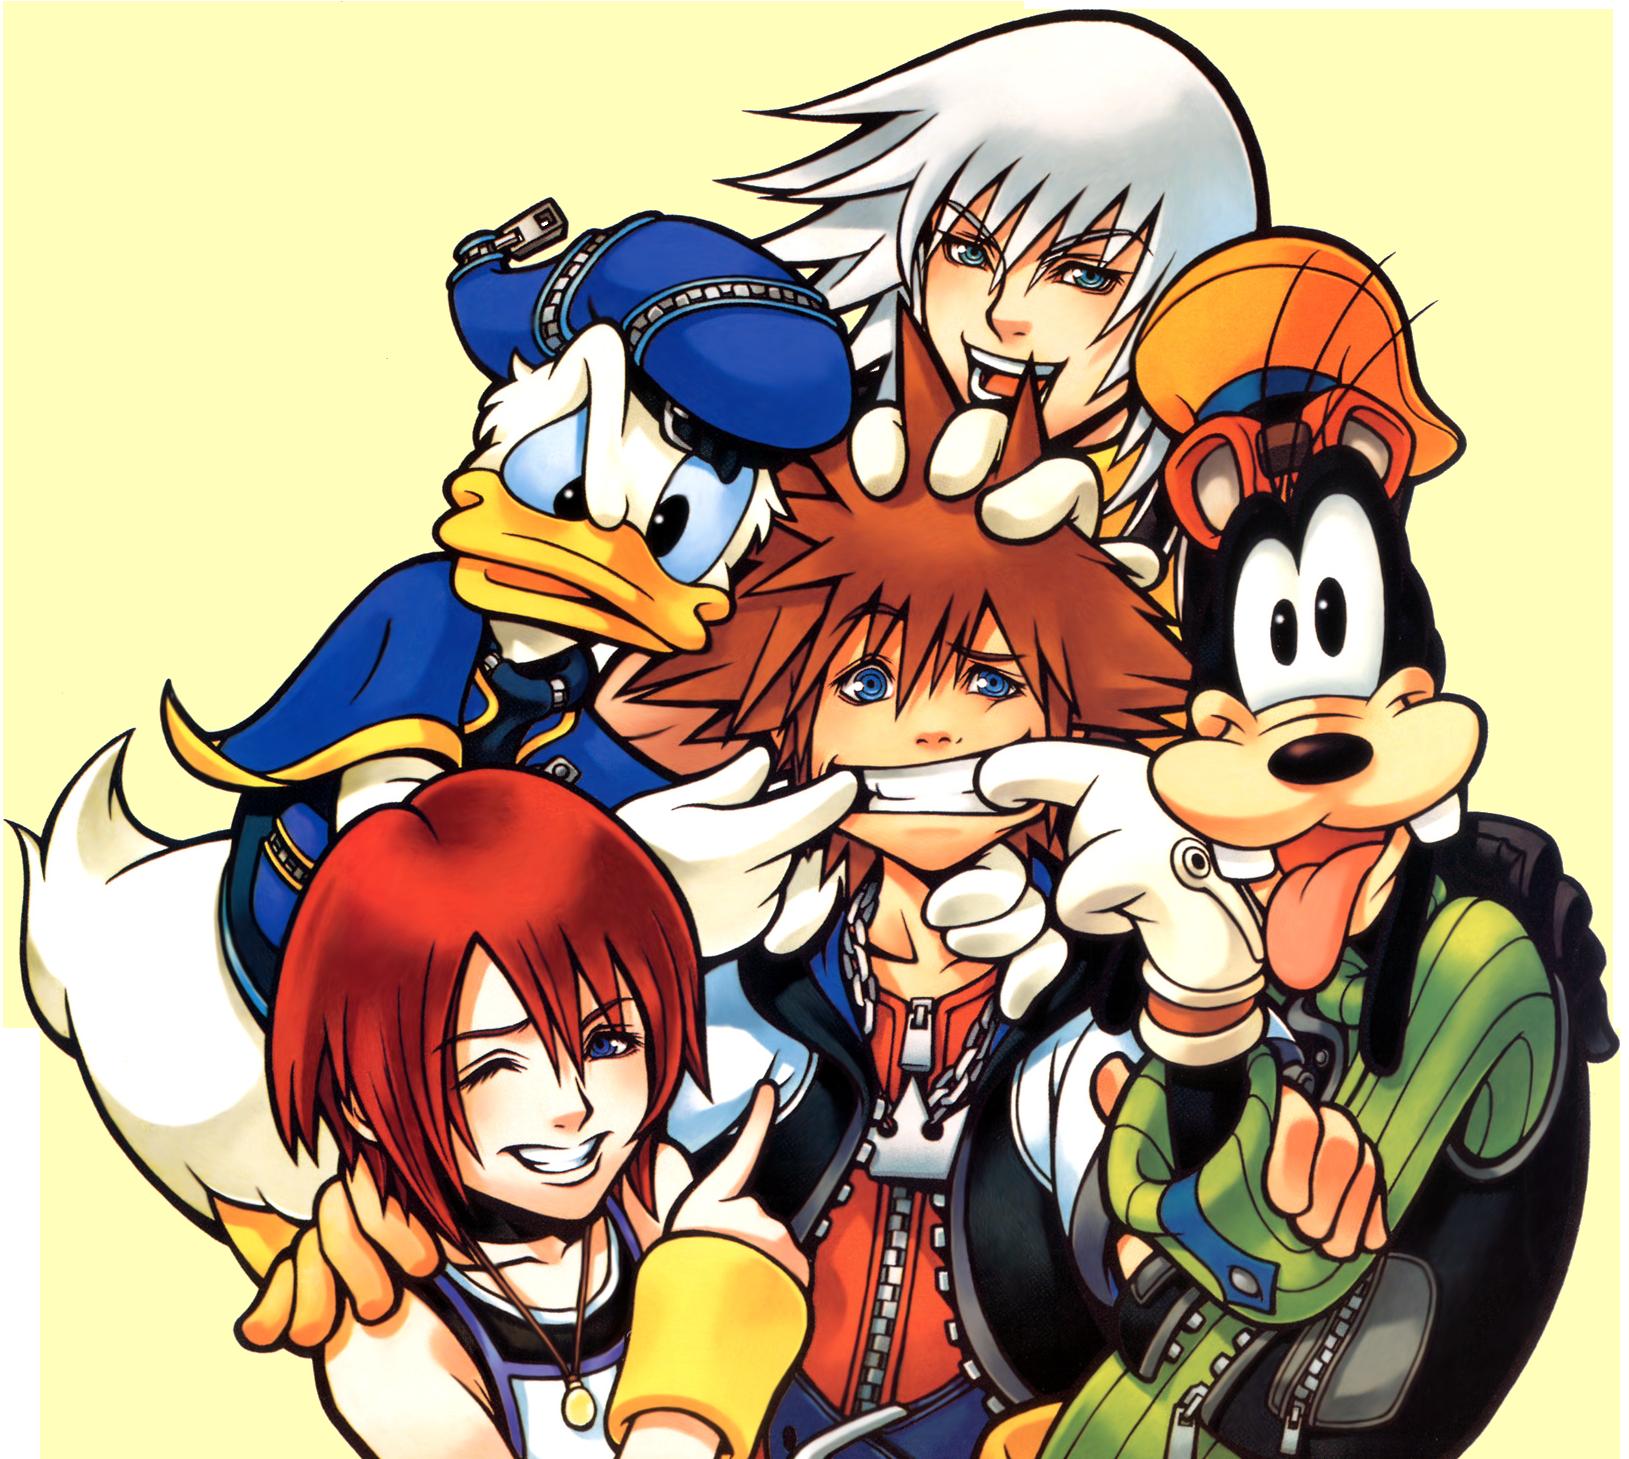 Kingdom Hearts Png Transparent Kingdom Hearts Png Images Pluspng